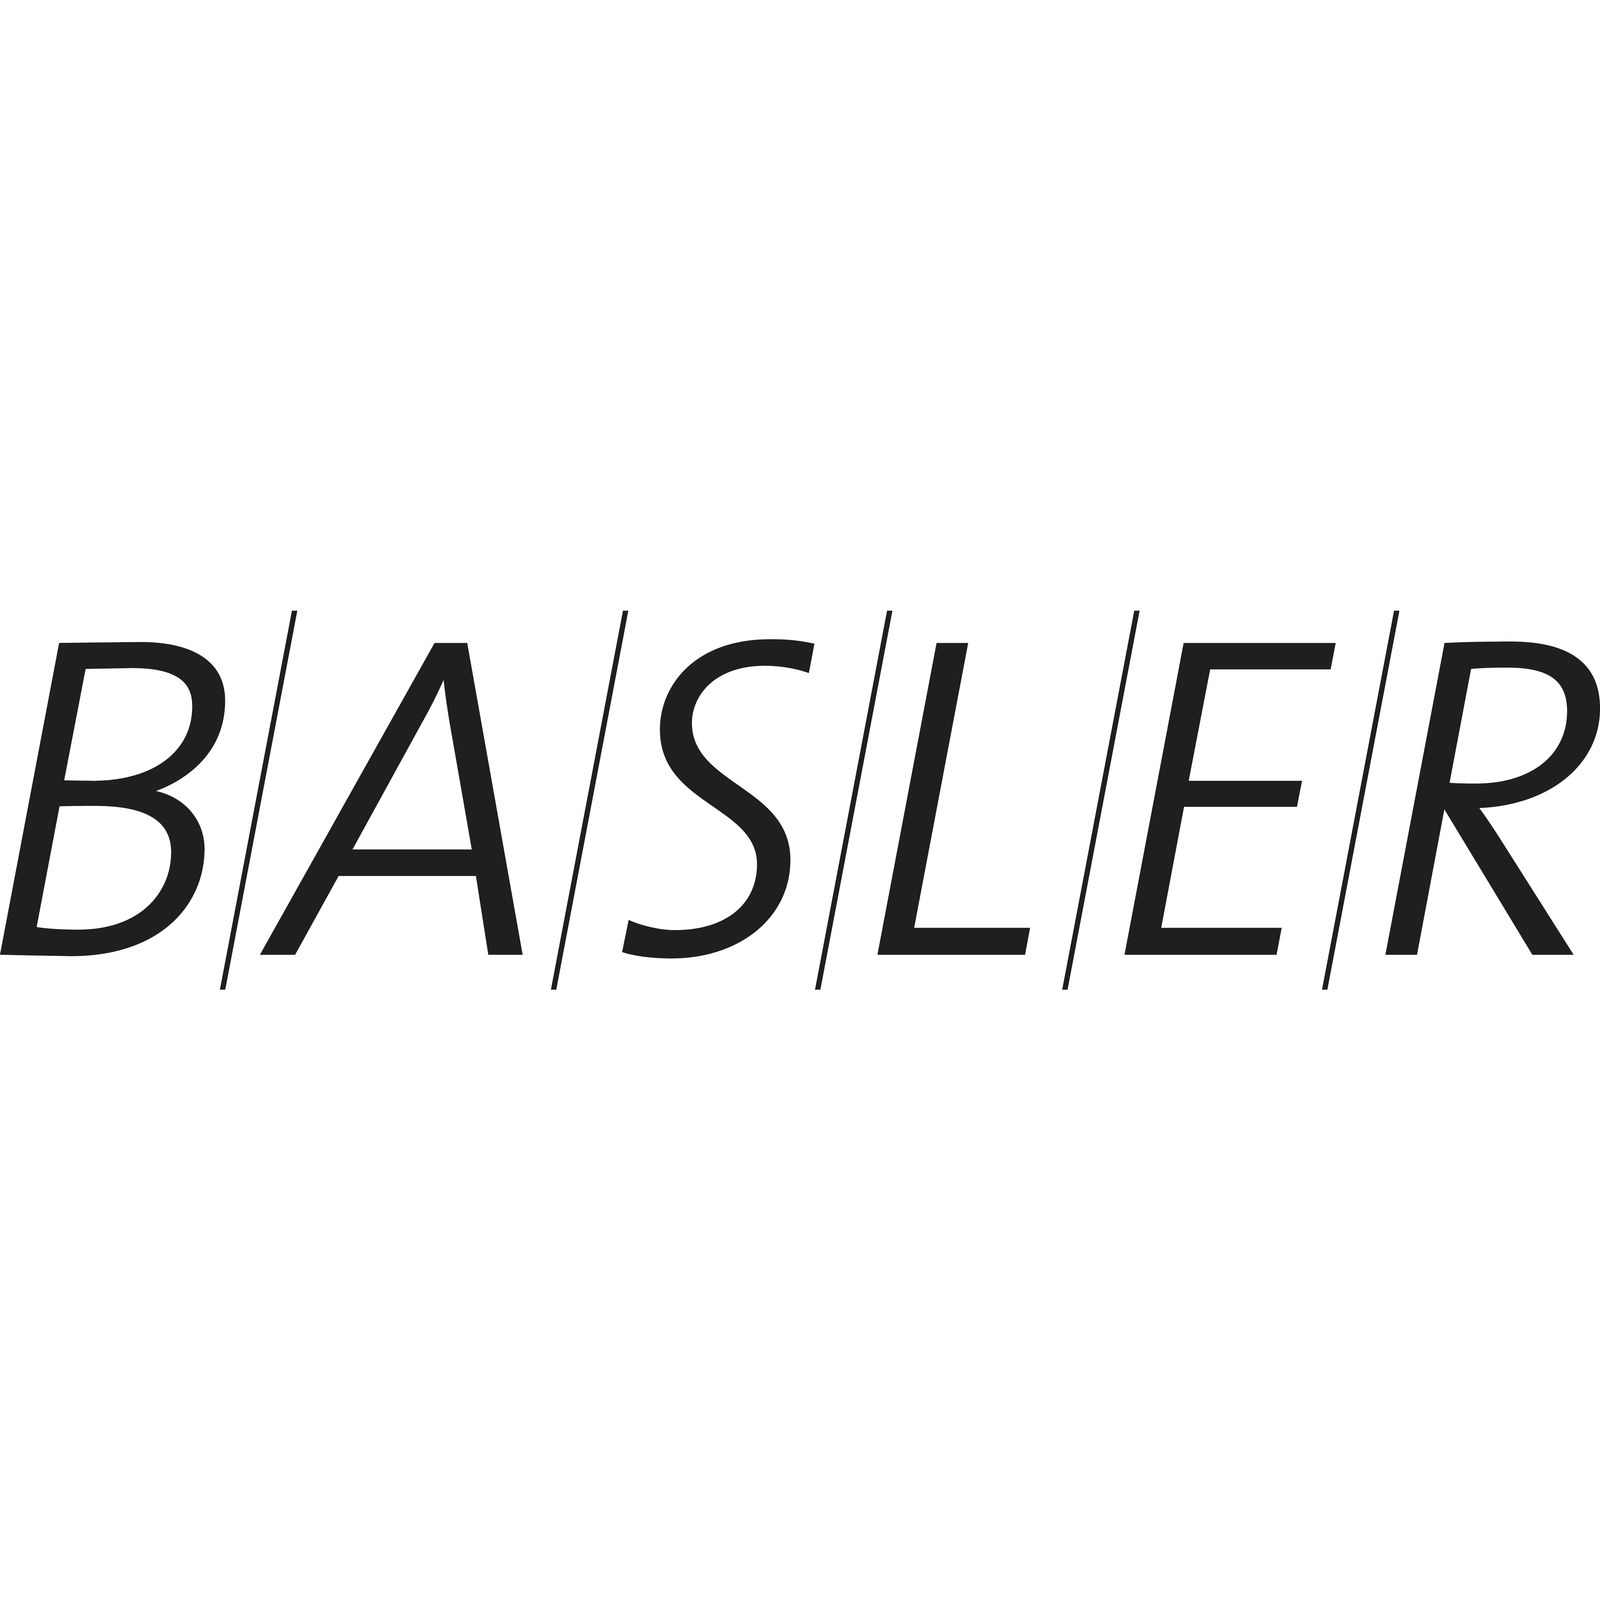 BASLER (Image 1)